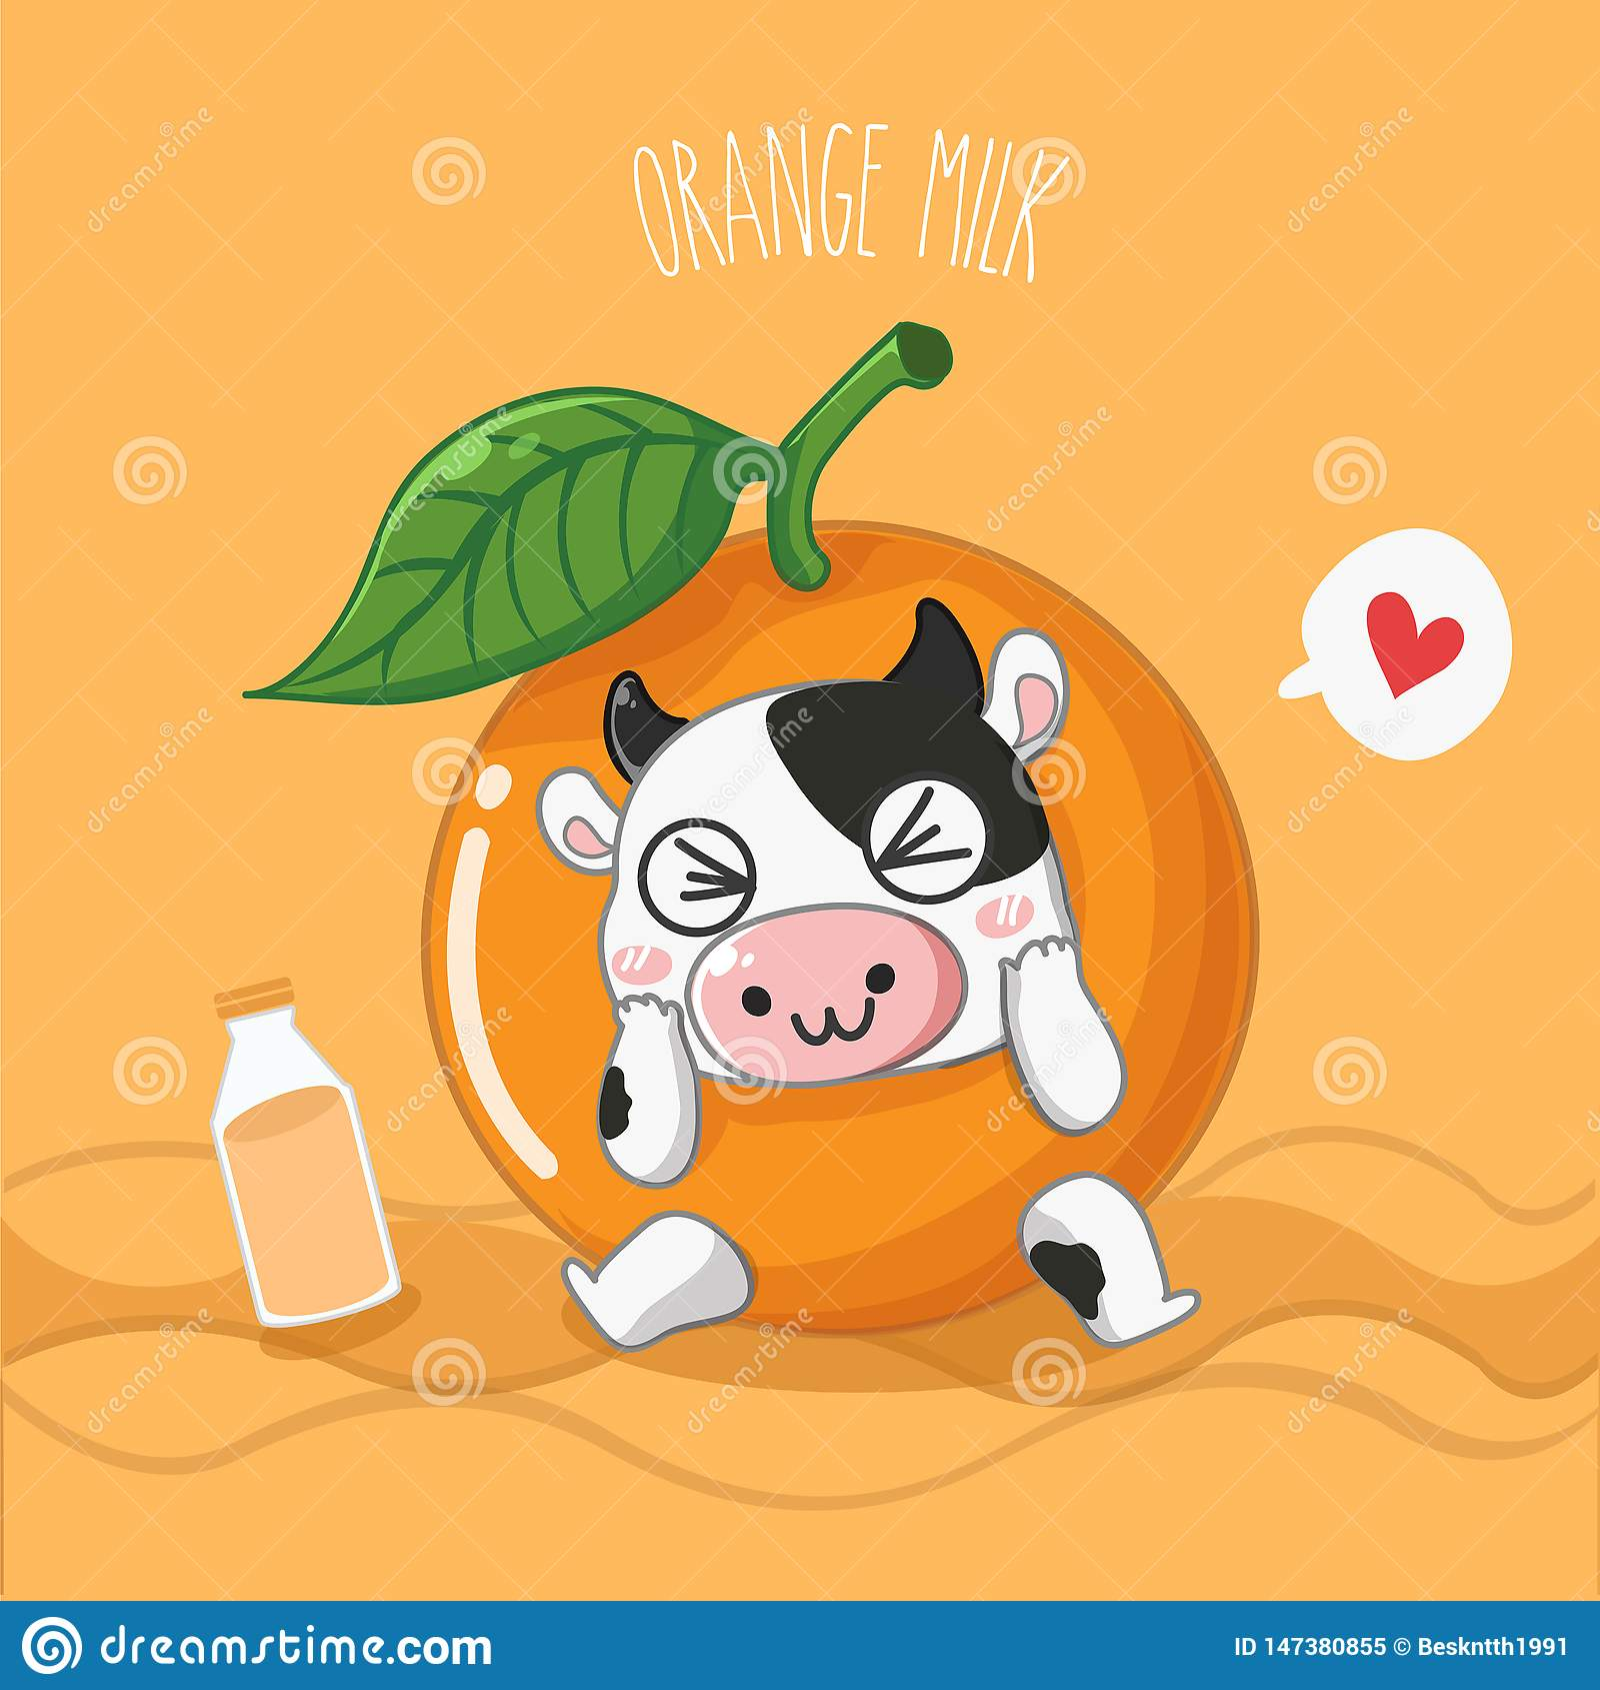 Оранжевая молочная корова молока очень милая